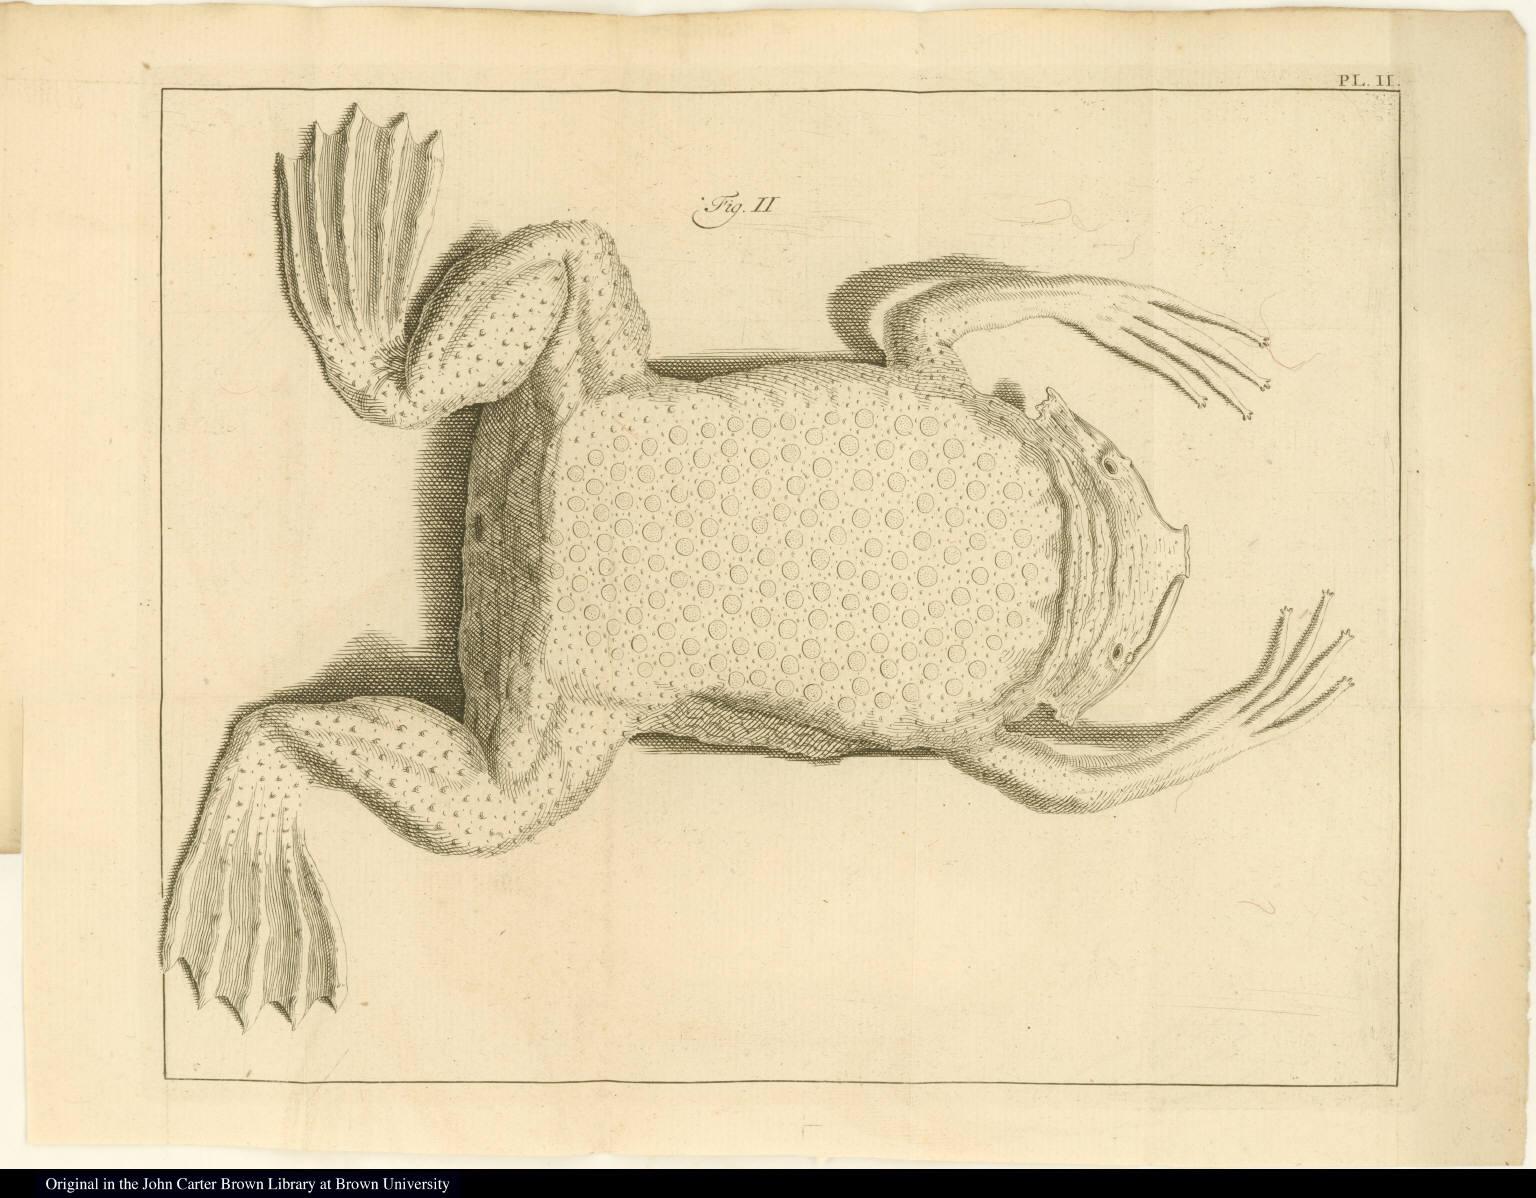 [Surinam toad]